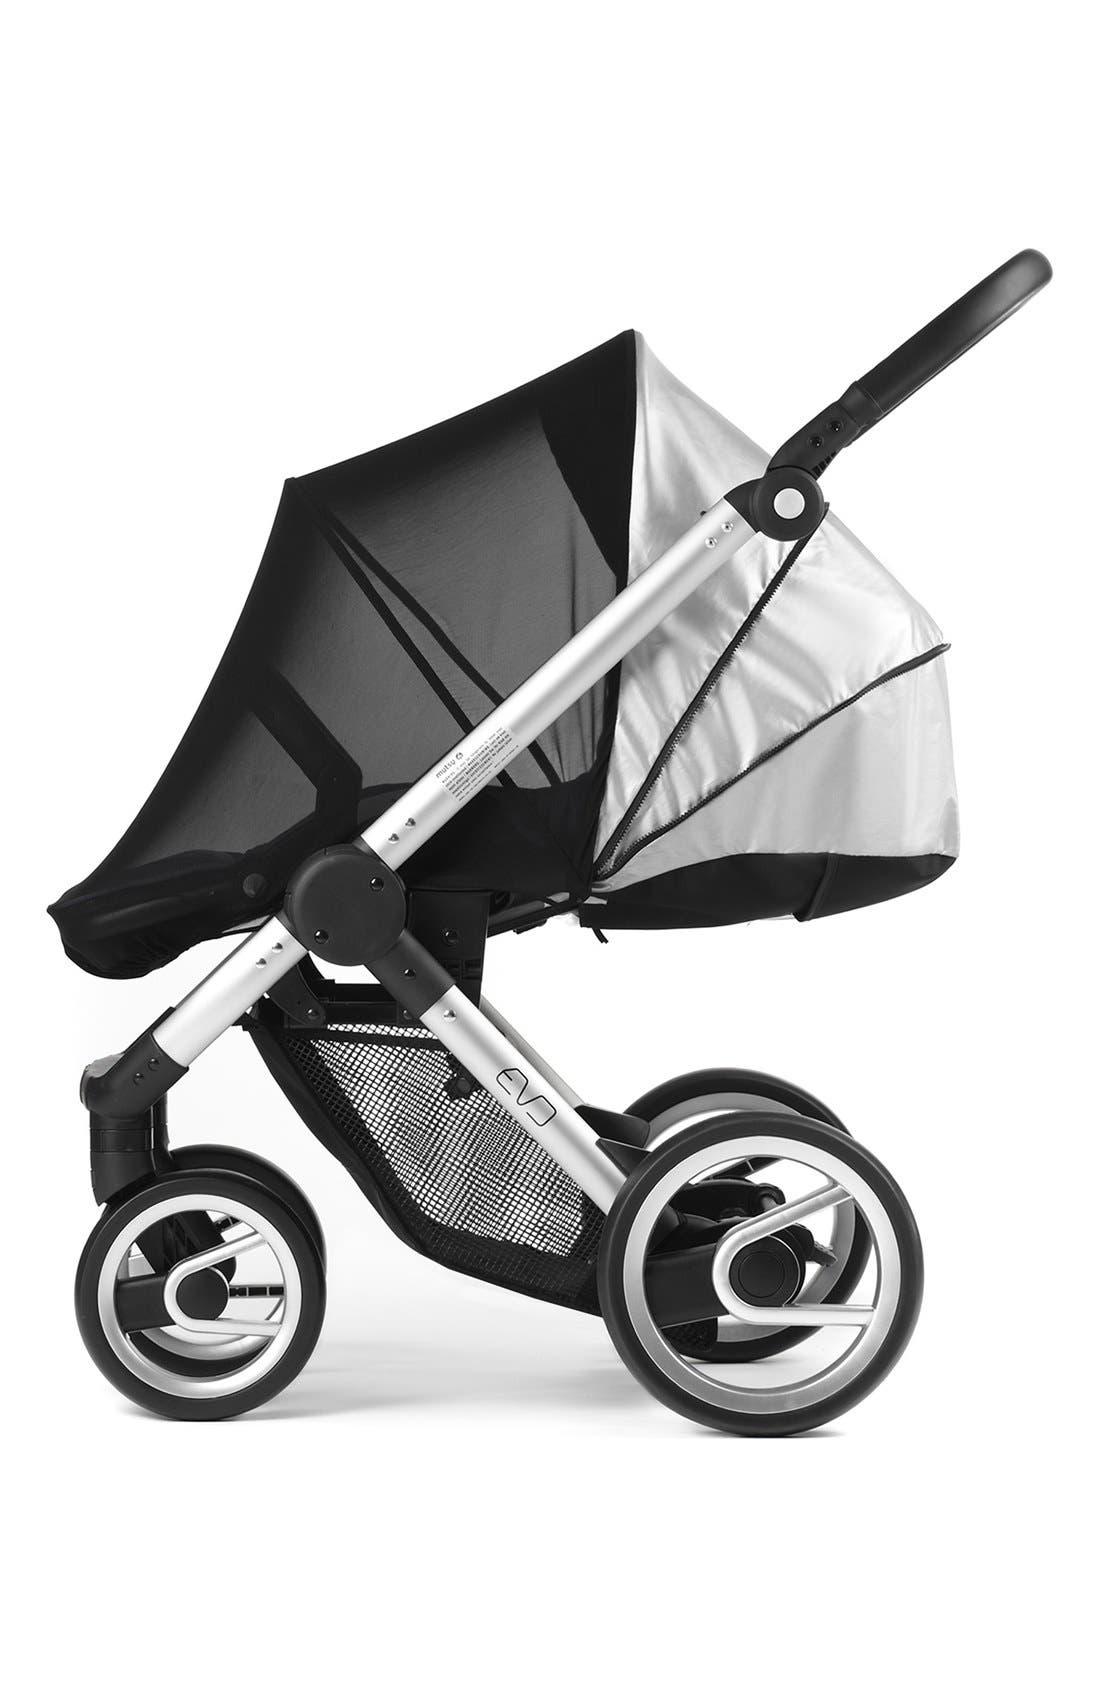 'Evo' Stroller Seat UV Cover,                             Main thumbnail 1, color,                             020